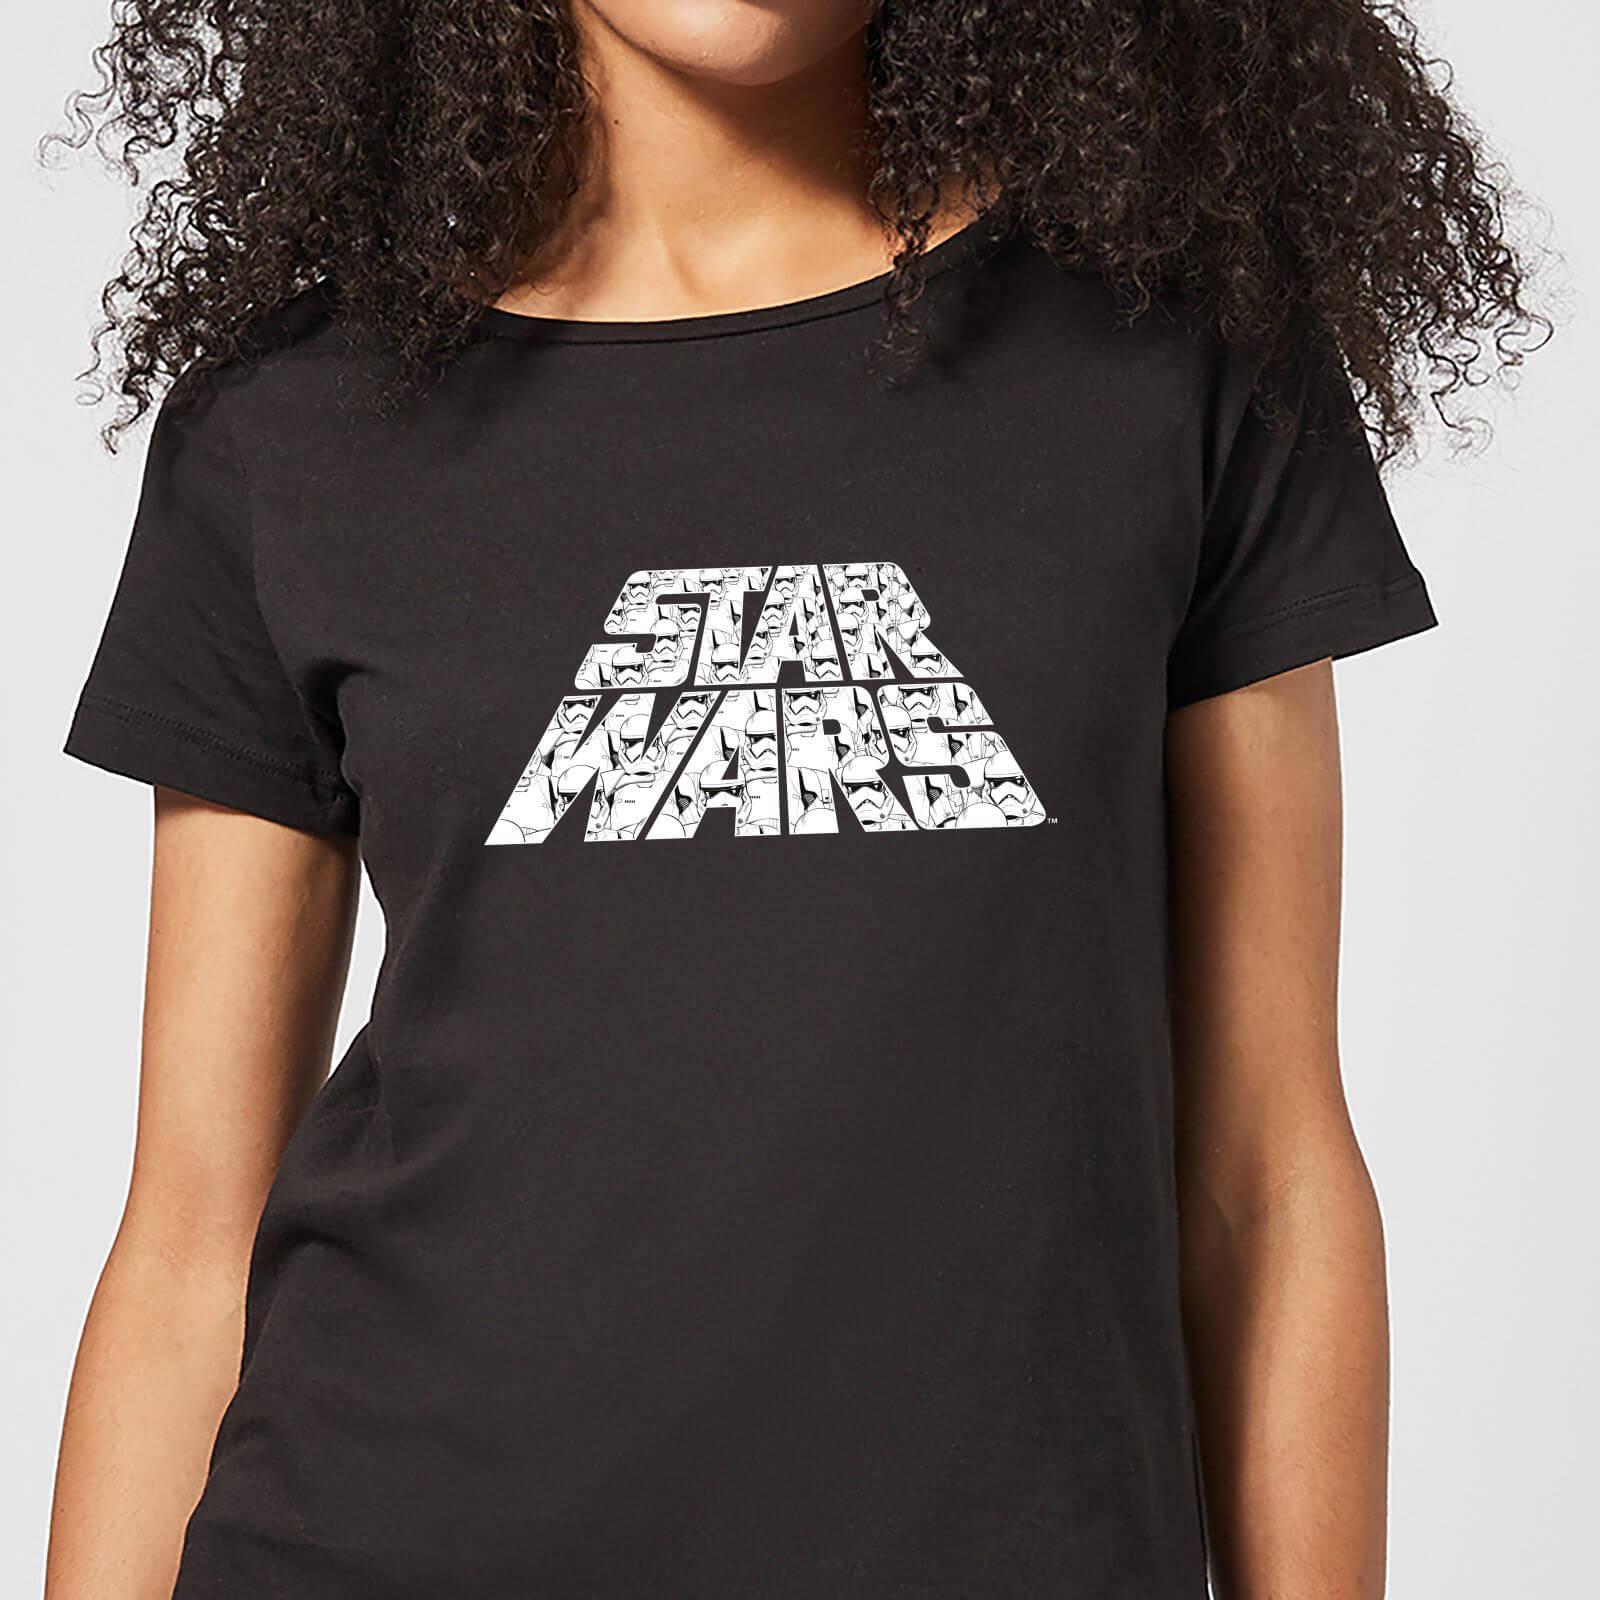 Star Wars The Rise Of Skywalker Trooper Filled Logo Women's T-Shirt - Black - XXL - Black